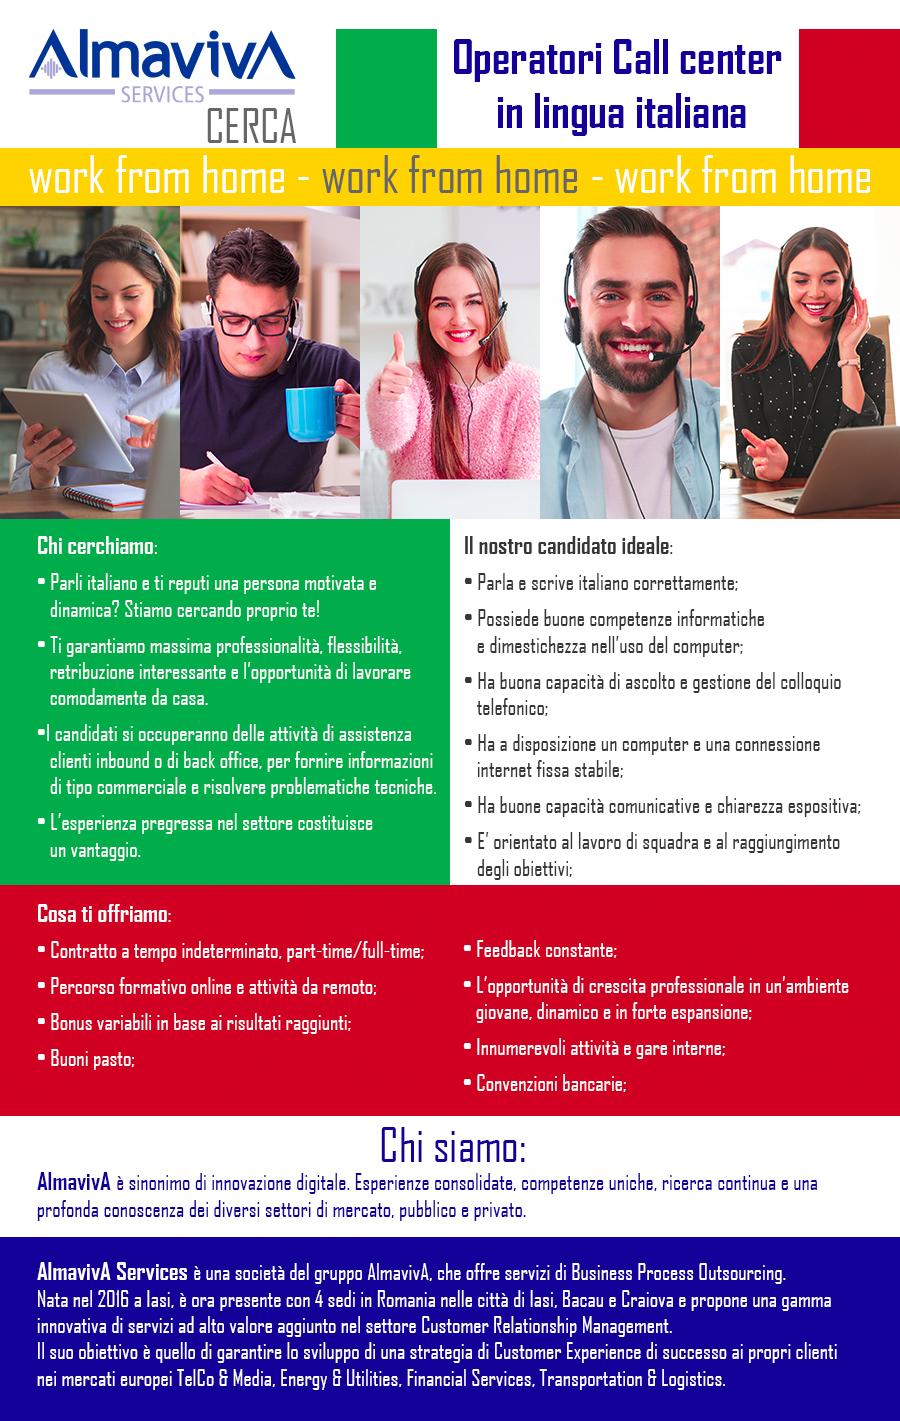 Operatore call center in lingua italiana - Work from Home